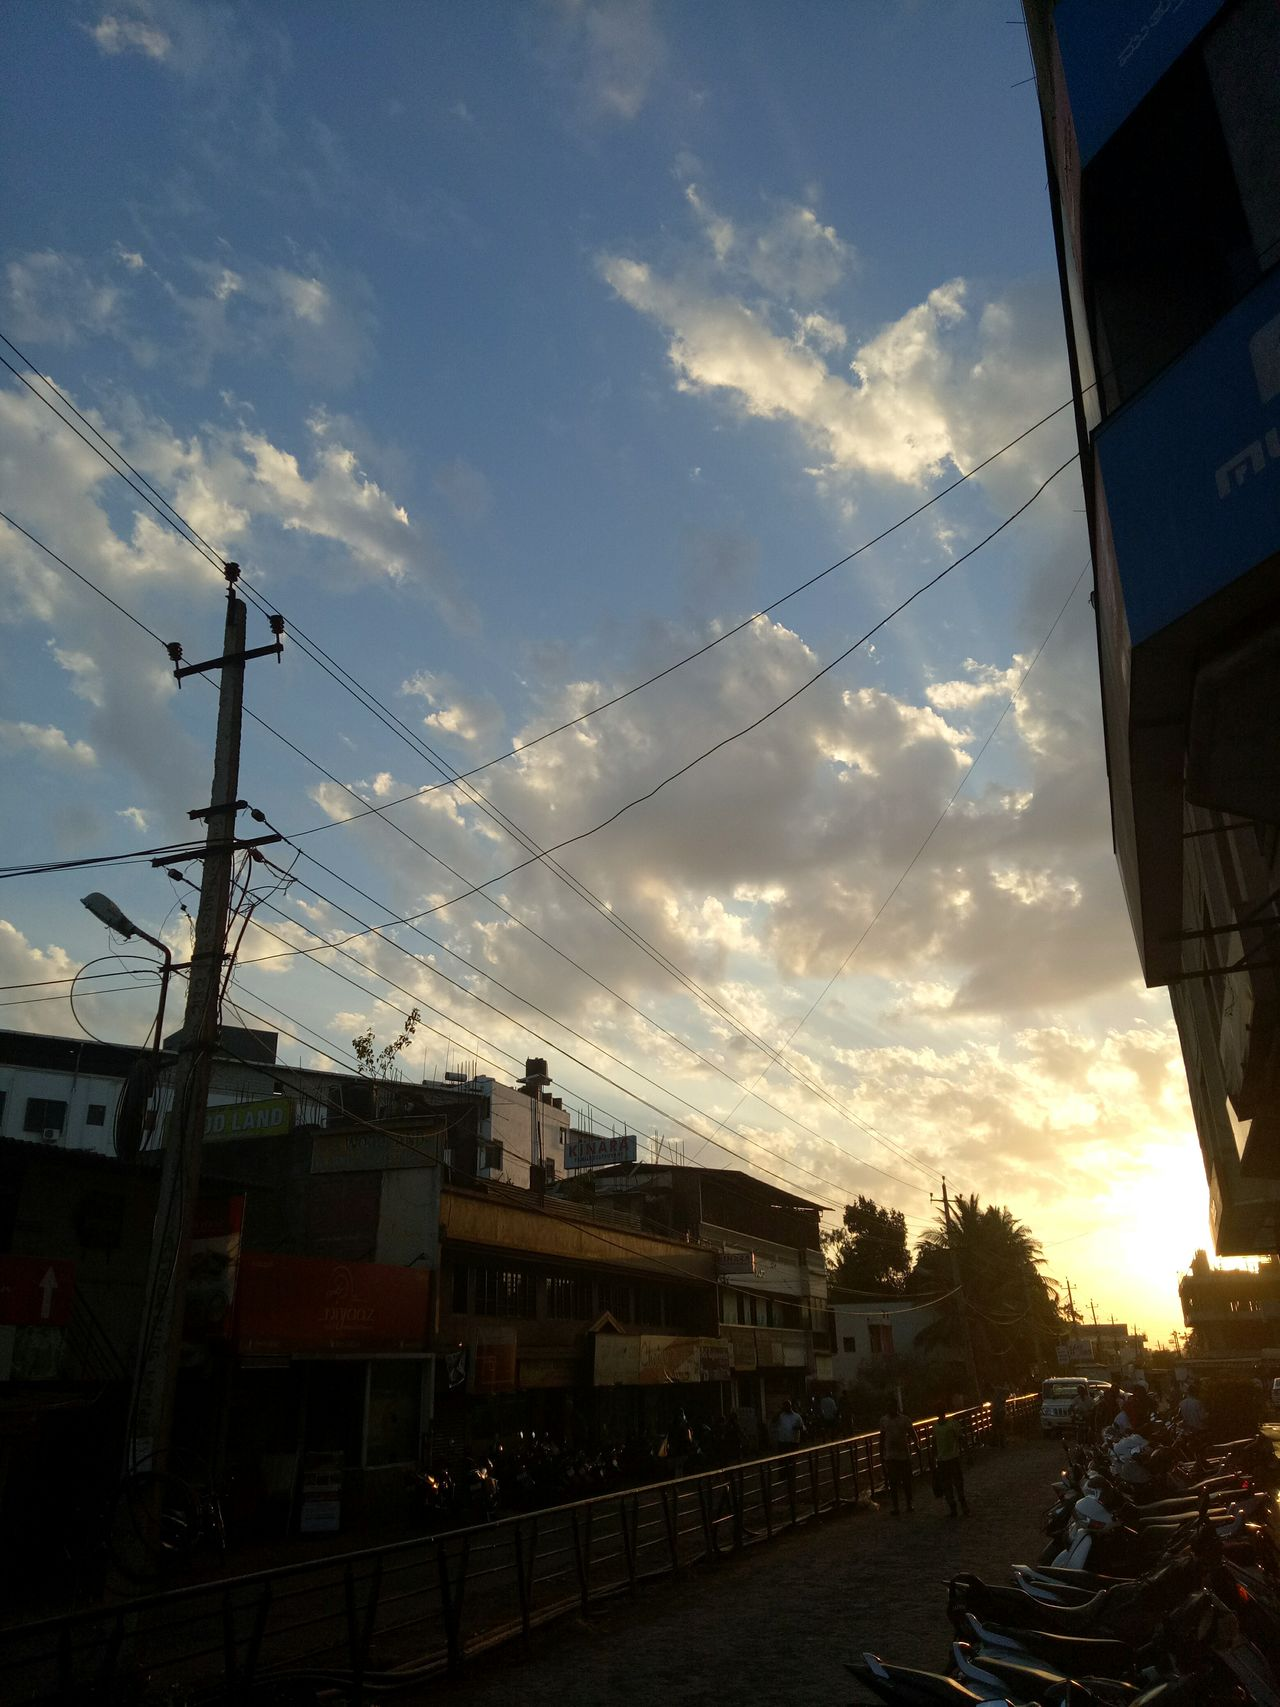 The sunset. Sky Cloud - Sky Sunset Outdoors Building Exterior Day Nature